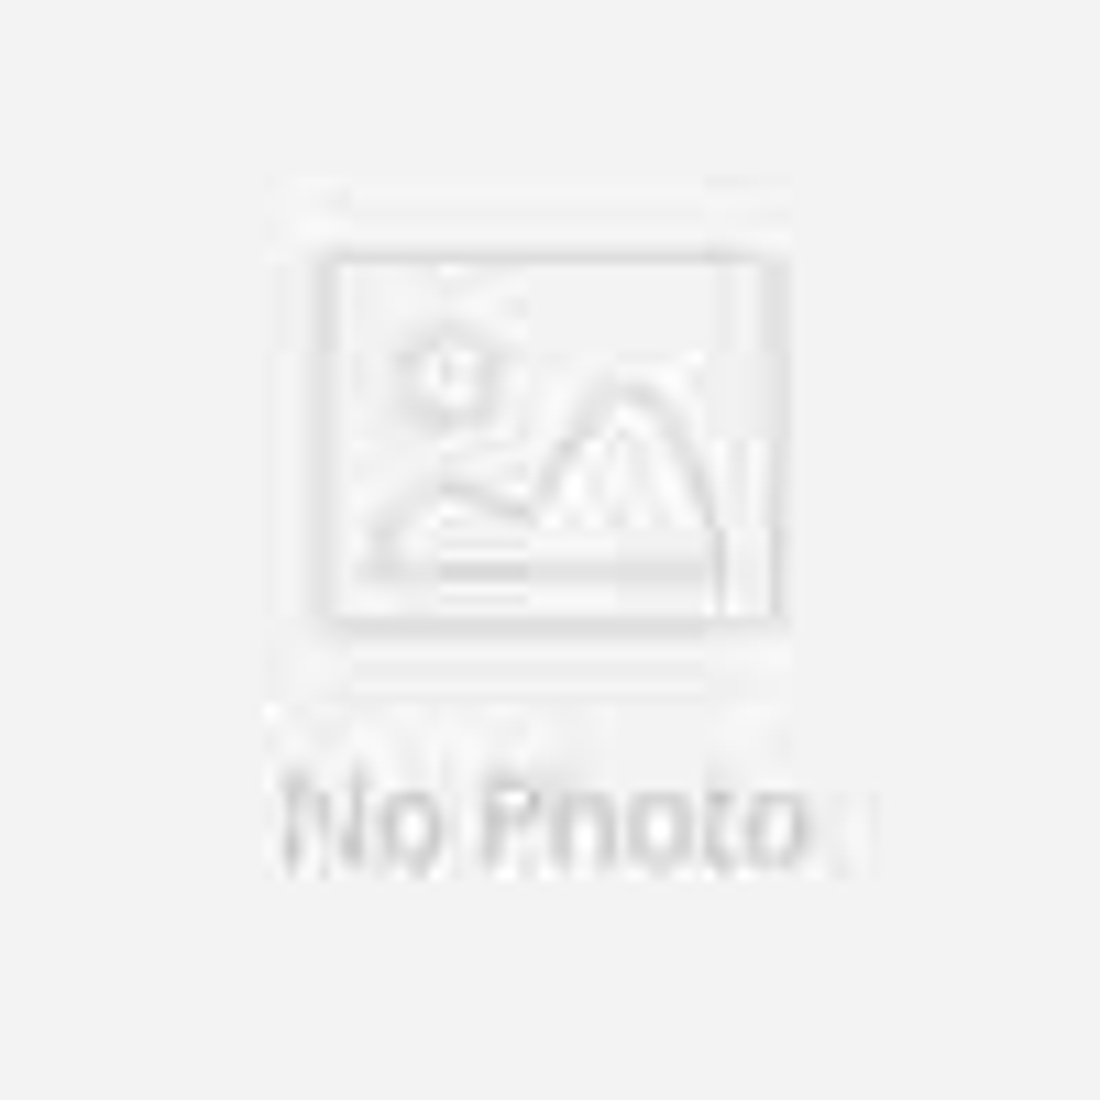 3 Size 10 Studs Anti-Slip Ice Winter Klimmen Antislip Sneeuwschoenen Spikes Grips Cleats Over Schoenen stijgijzers snowboard schoenen